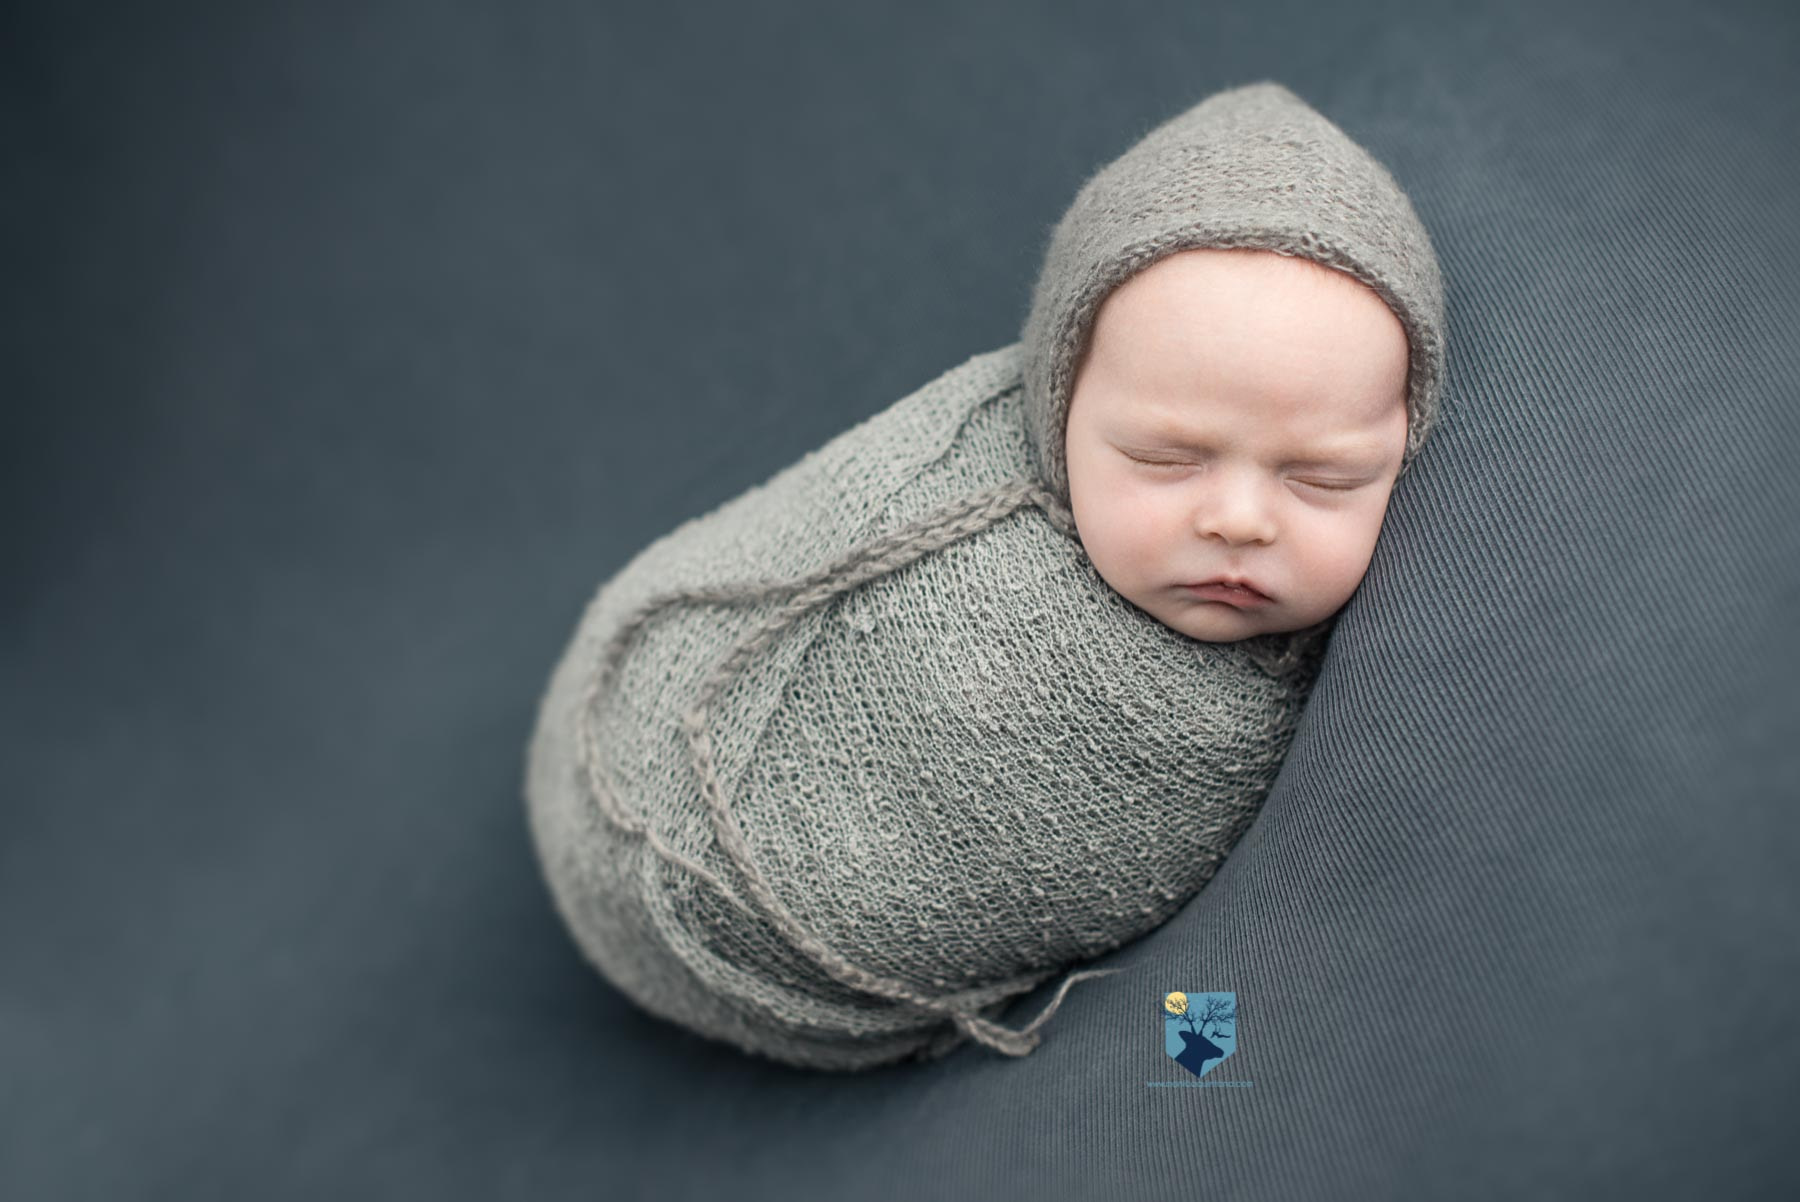 fotografa figueres girona roses emporda recien nacido nado newborn fotografia fotos estudio bebe